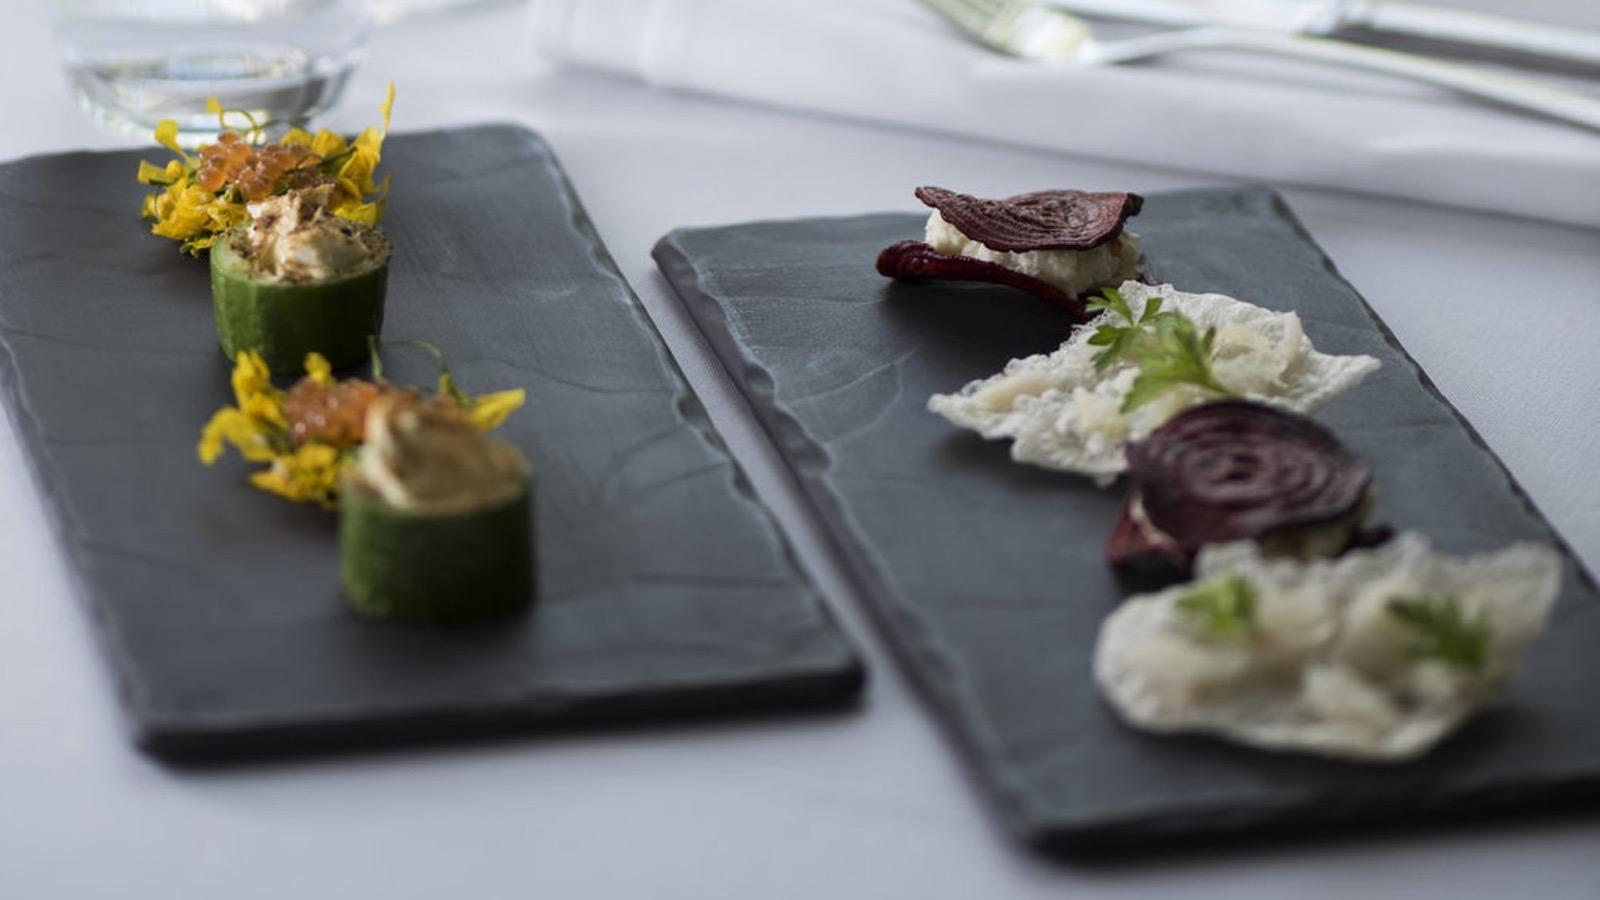 Award winning food at Gladioli